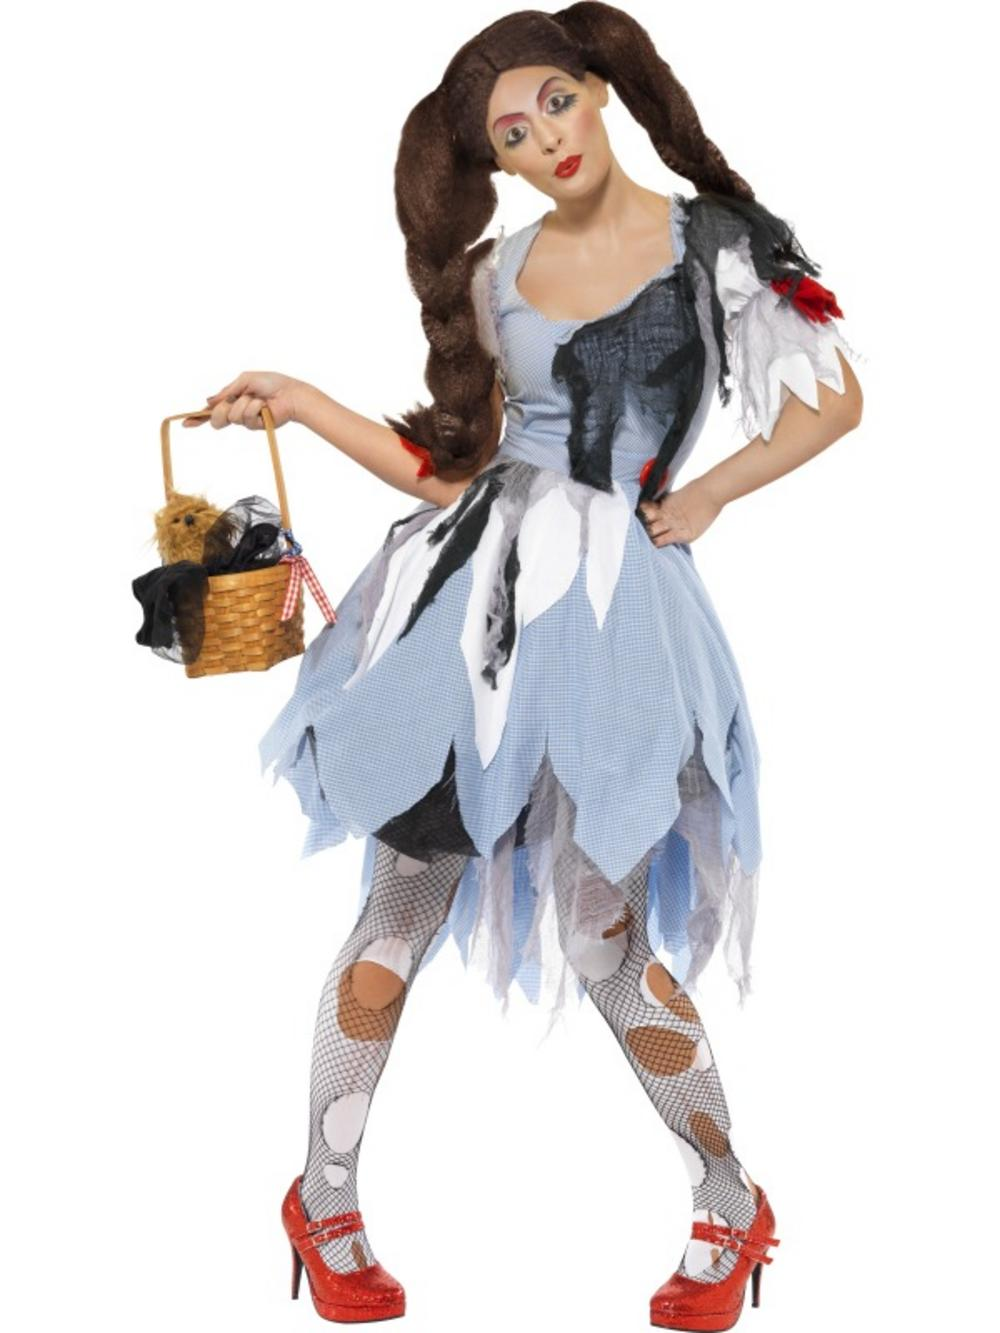 Wizard of Oz Costumes | Mega Fancy Dress